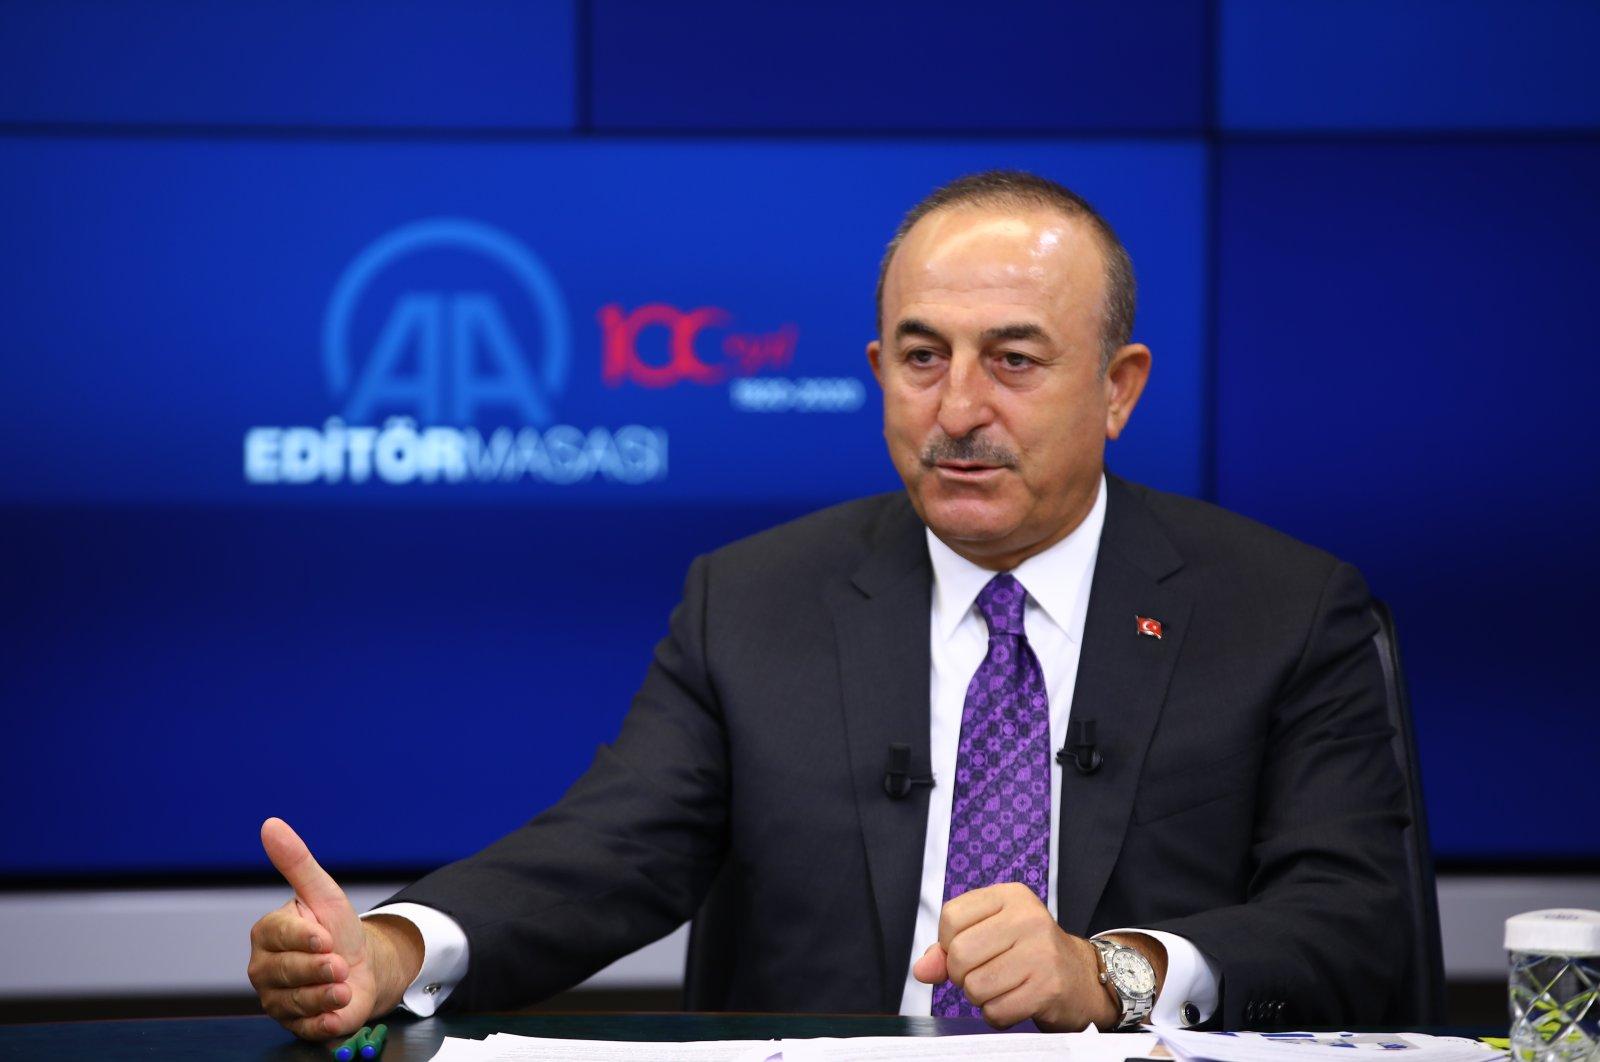 Foreign Minister Mevlüt Çavuşoğlu speaks at Anadolu Agency's Editor's Desk, Ankara, Sept. 30, 2020. (AA Photo)